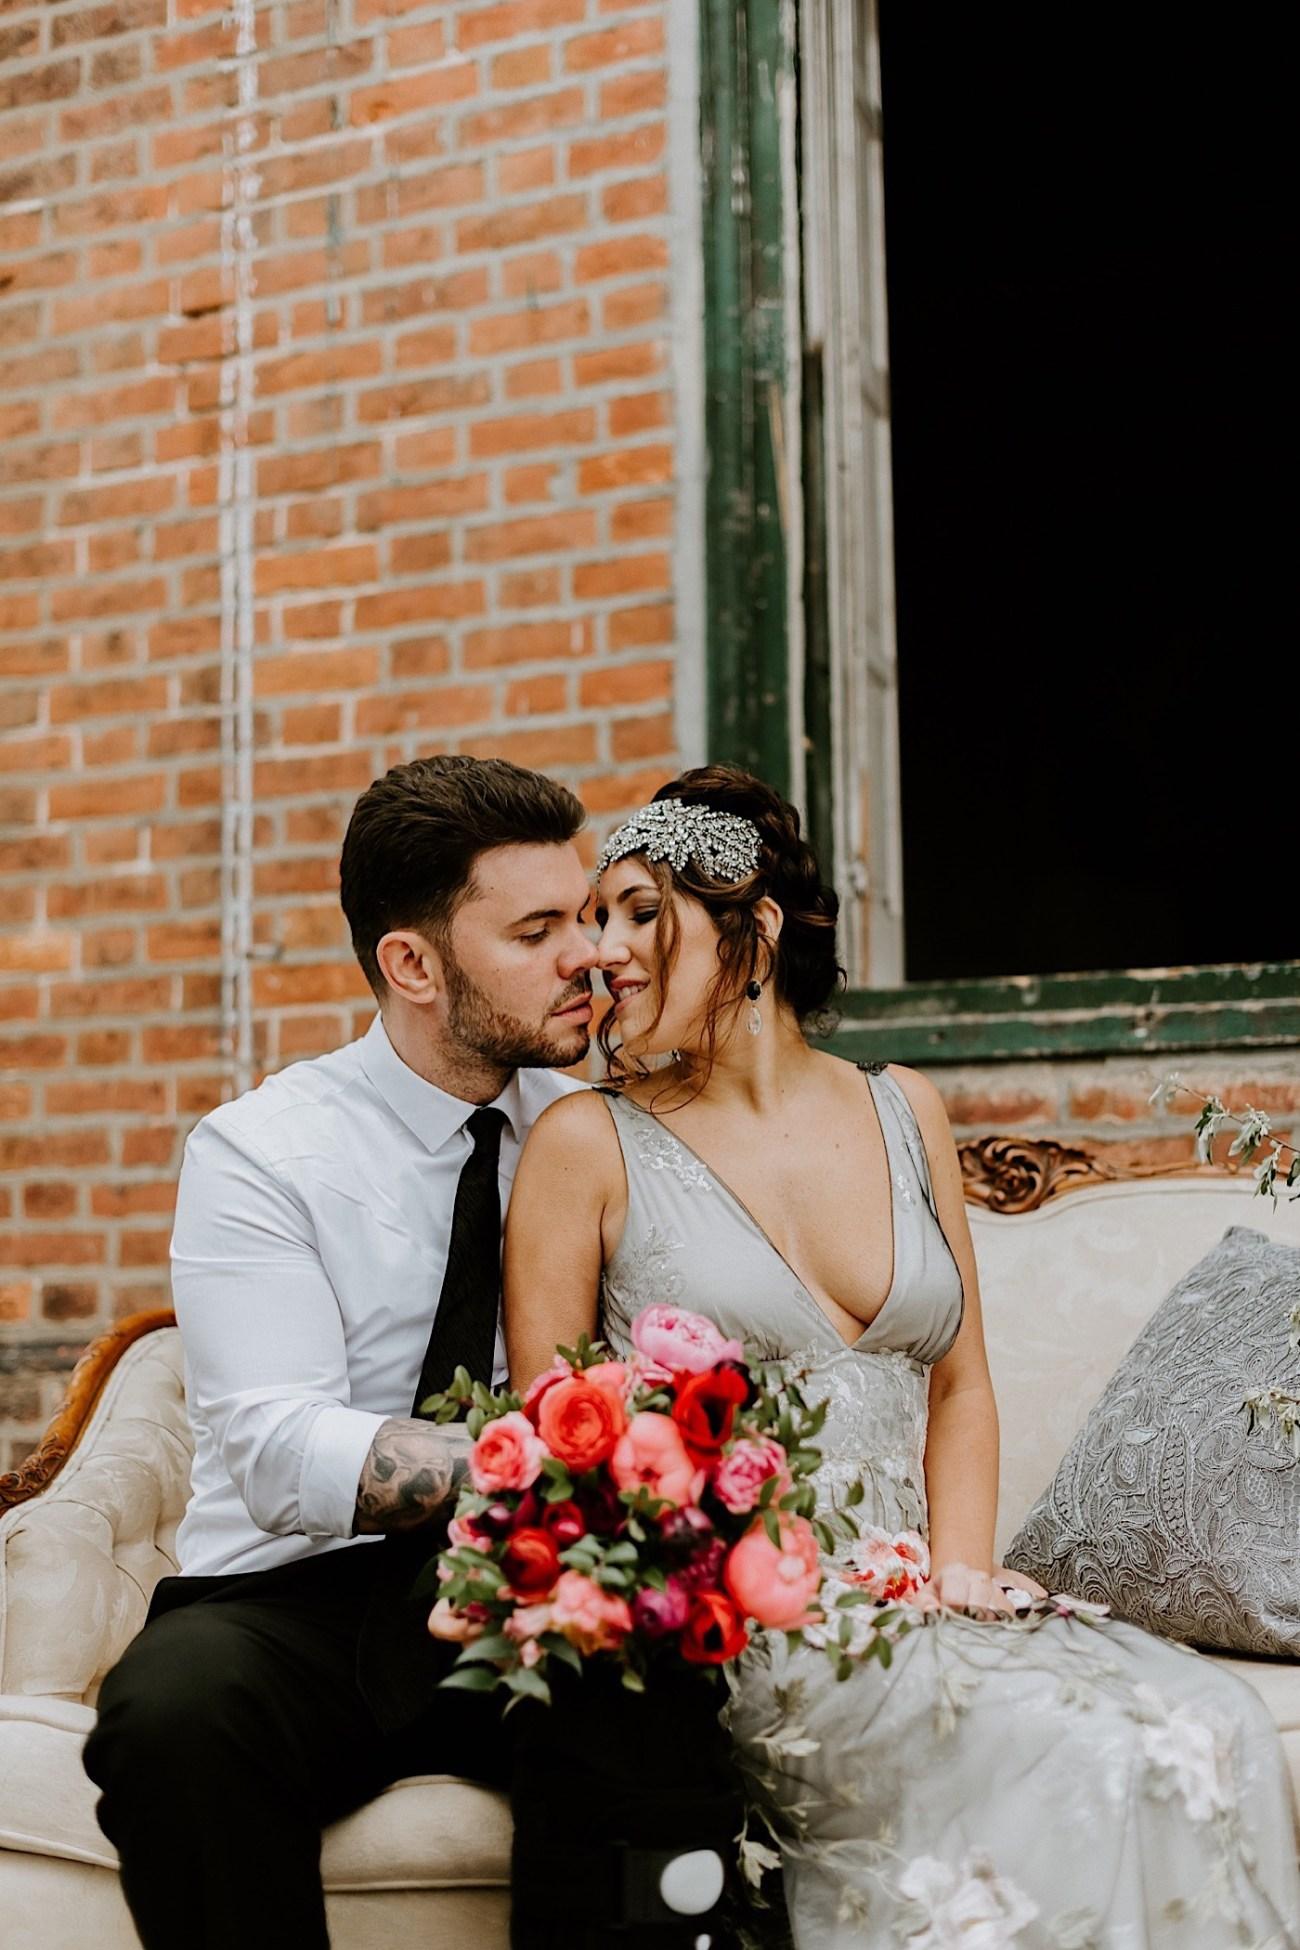 Romantic Phildalephia Wedding Photographer Philadelphia Wedding Venue Barnsley Manor Wedding 53